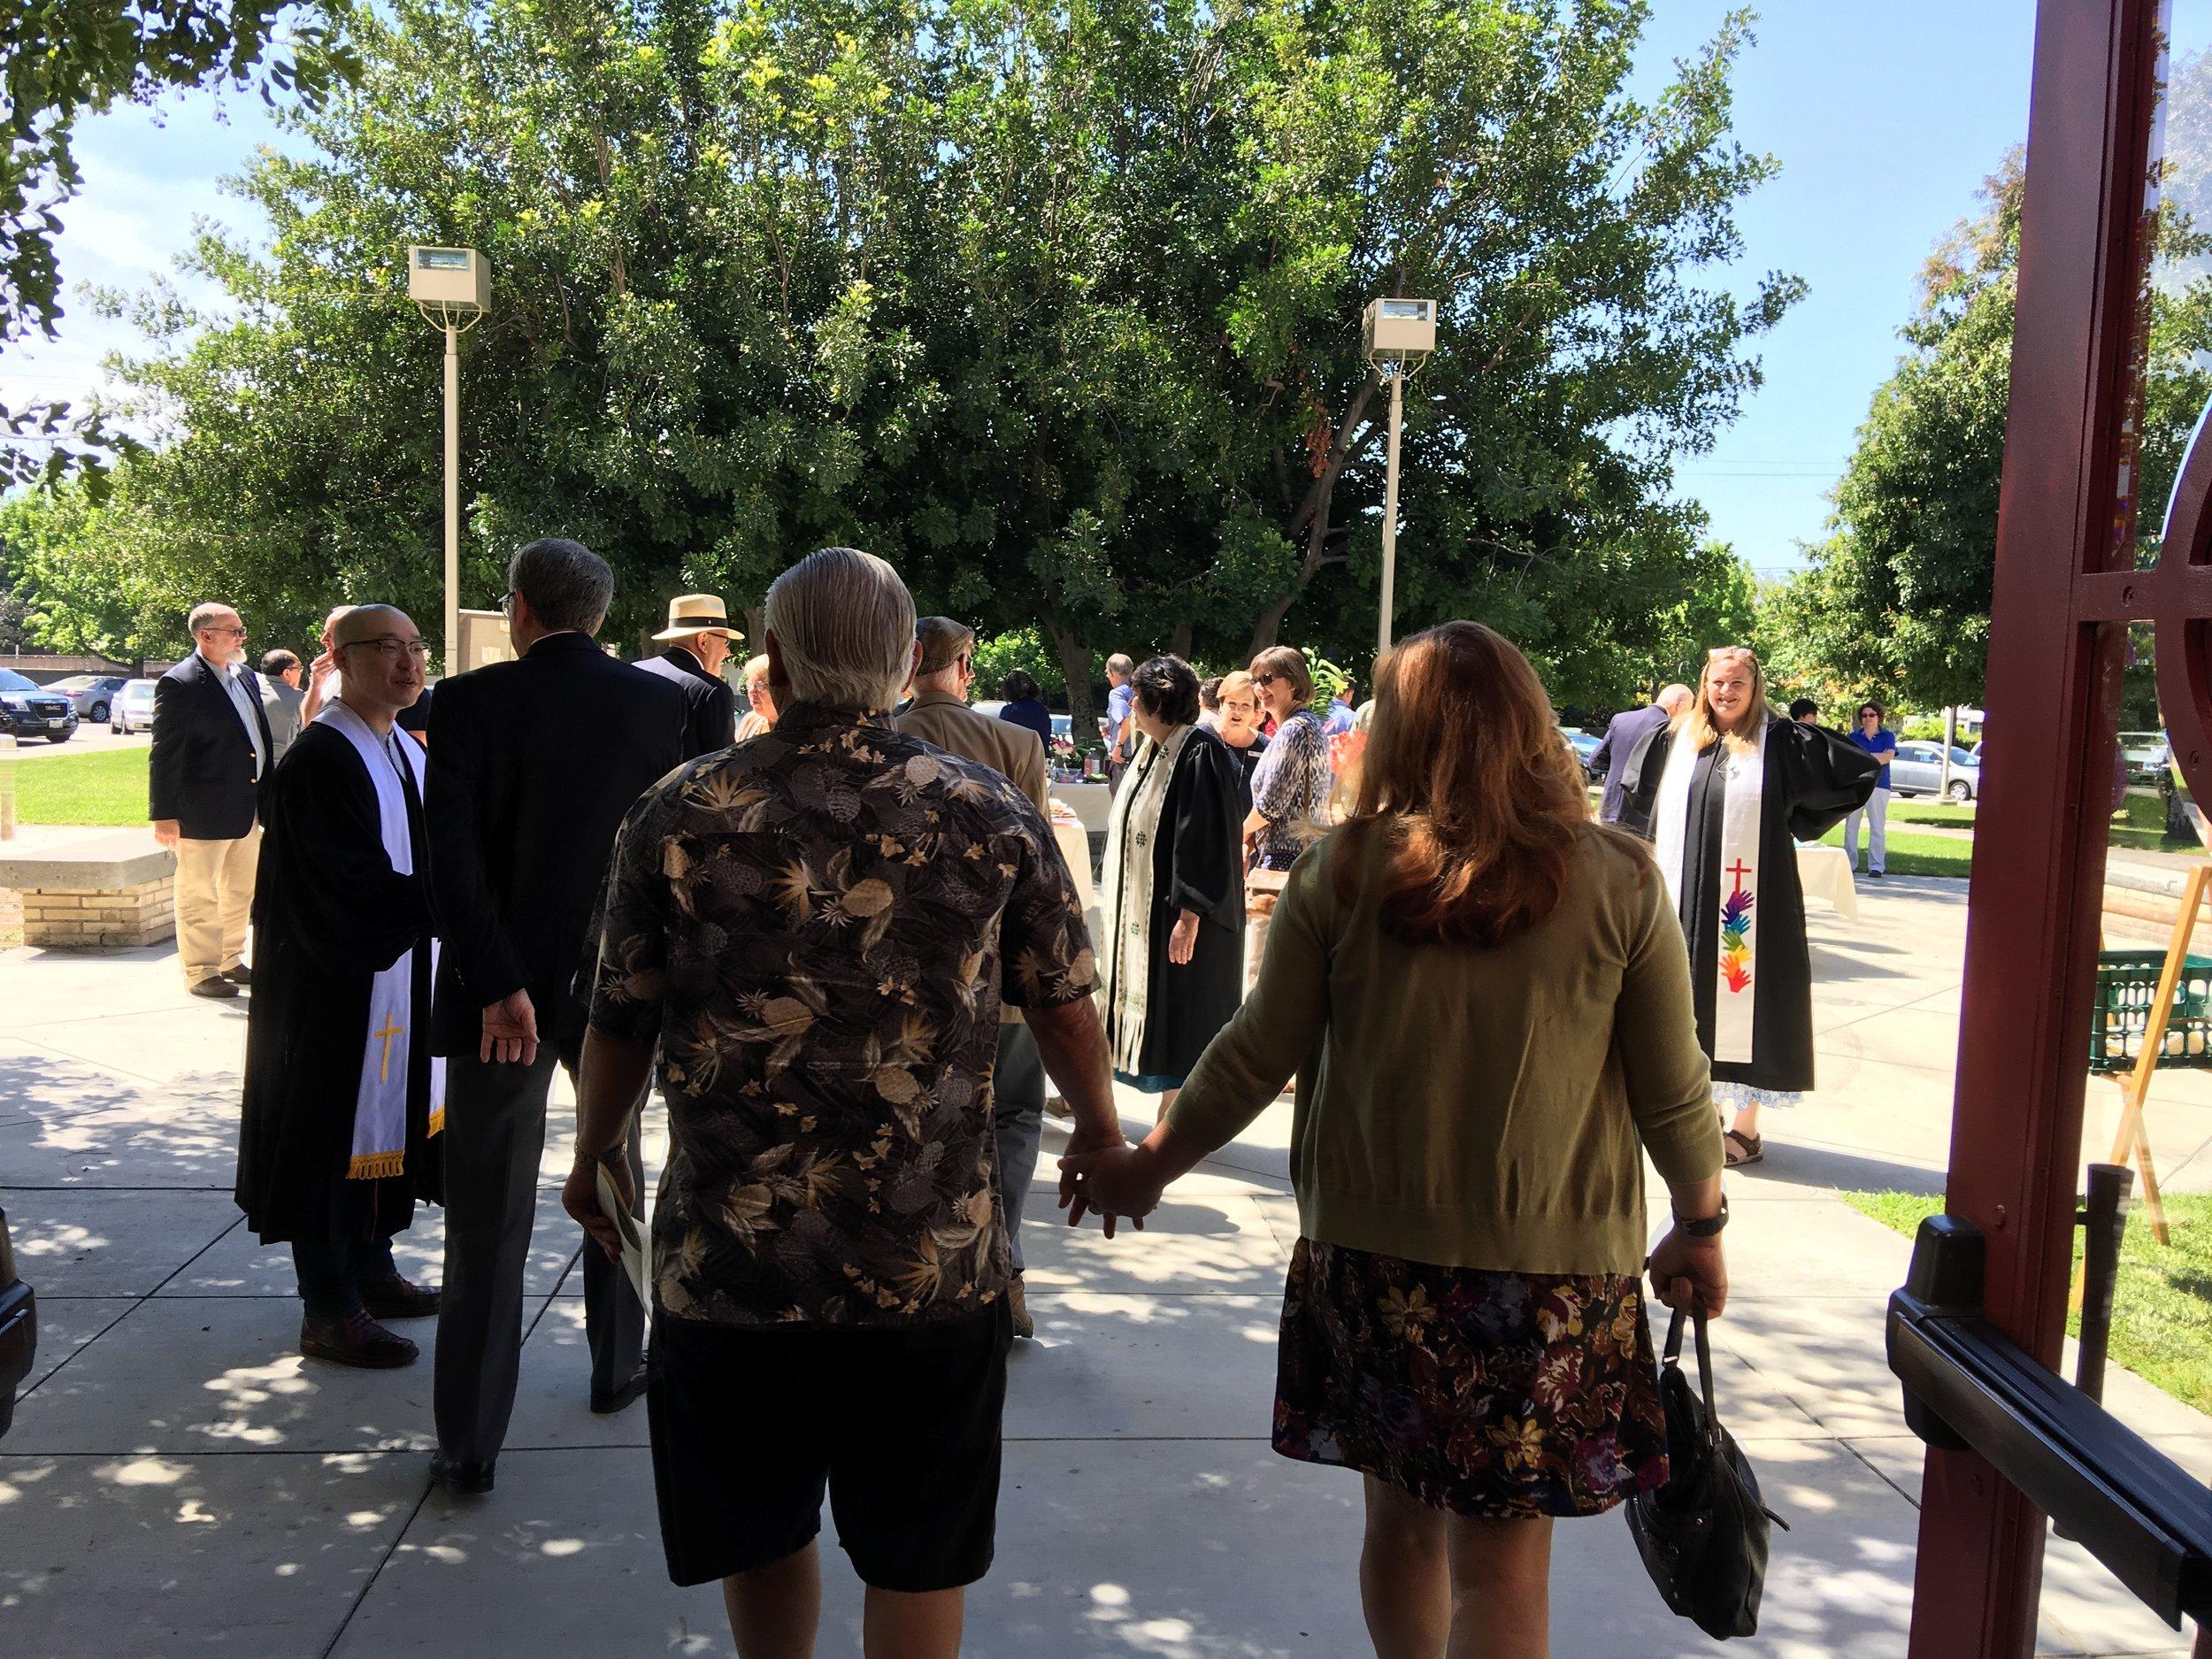 claremont-presbyterian-church-life-visitors.JPG